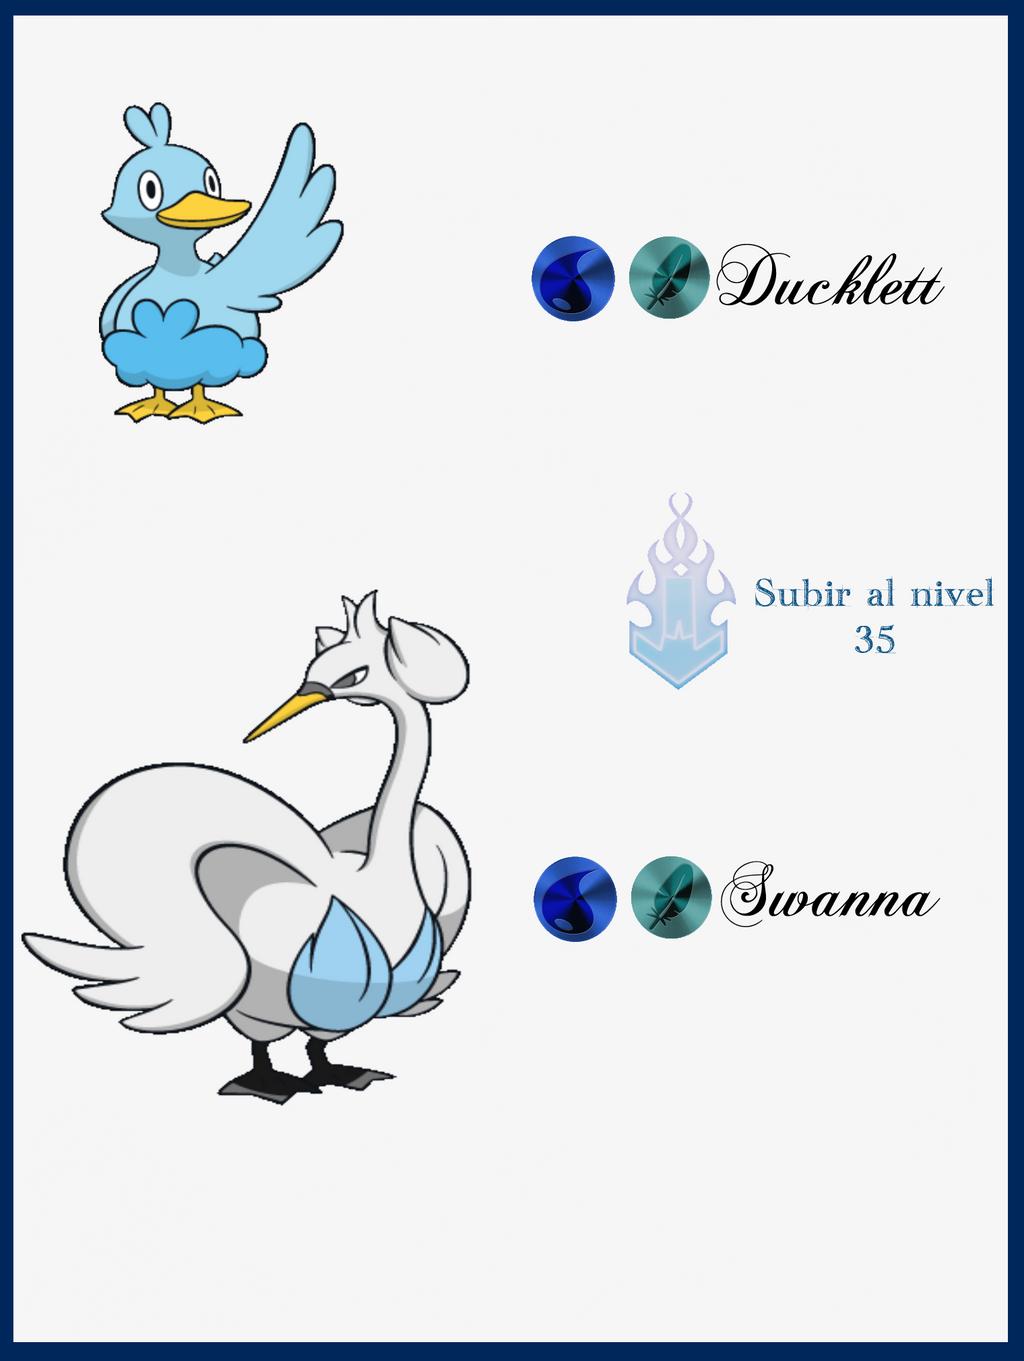 252 Ducklett Evoluciones by Maxconnery on DeviantArt